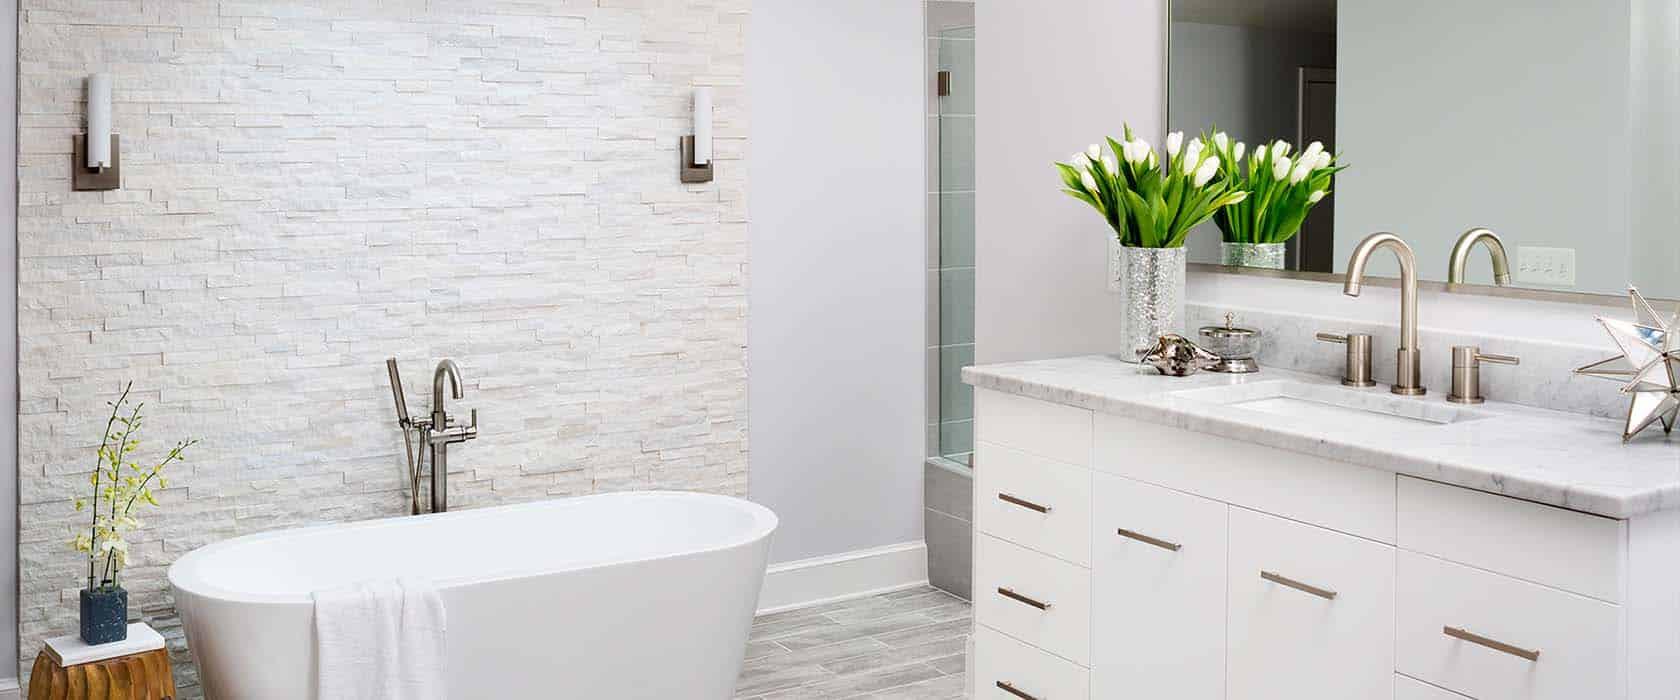 Bathroom Sink into happiness CASE design